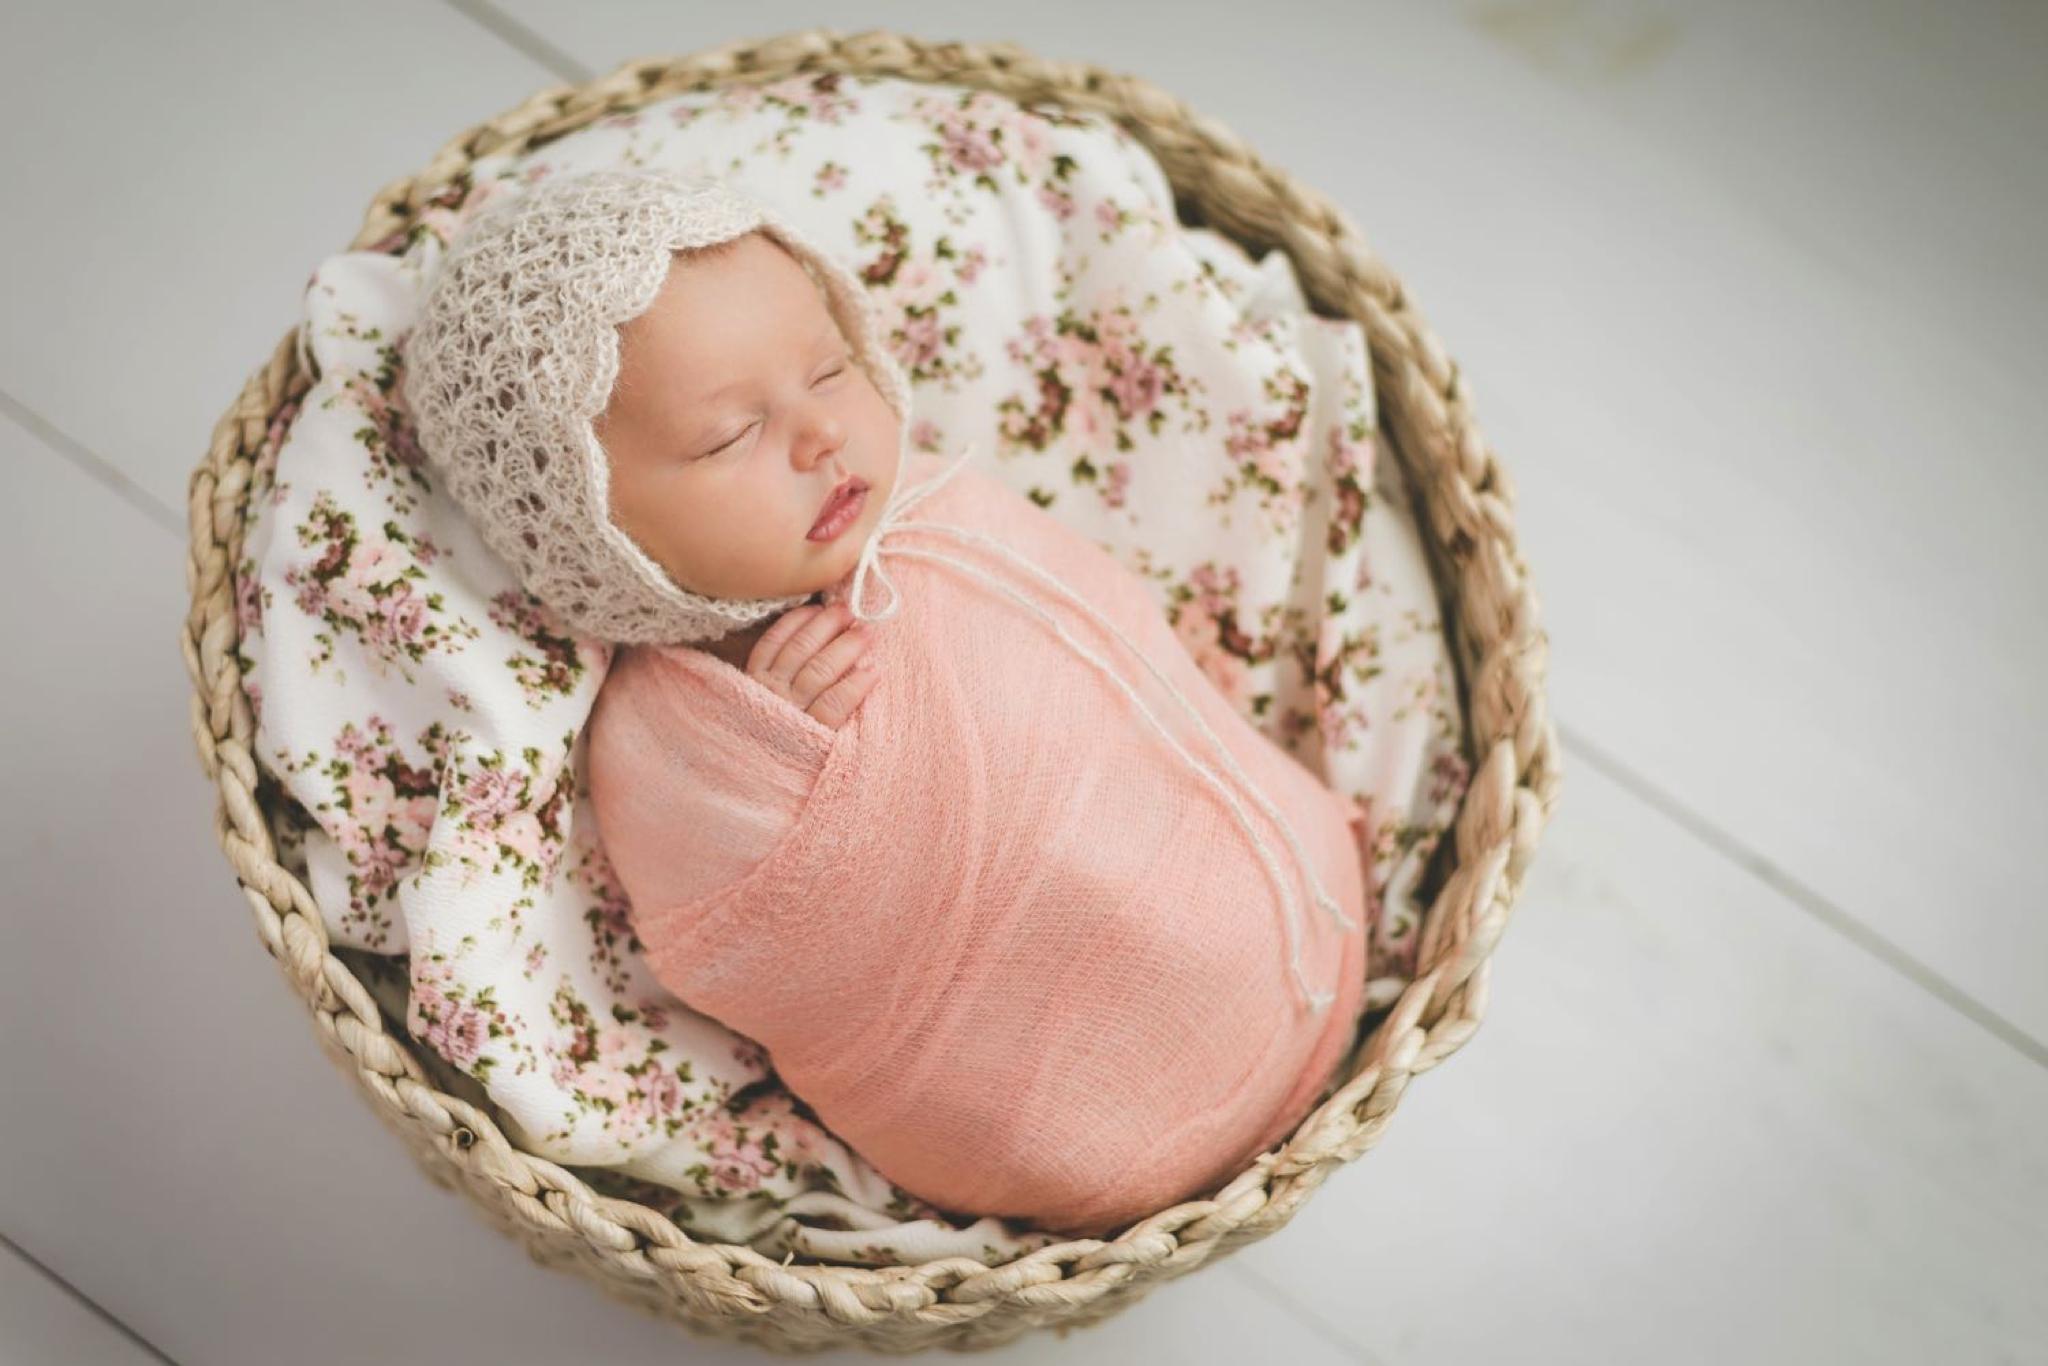 Baby Collins Margaret | Bright Moon Photography | Greenville Newborn Photographer